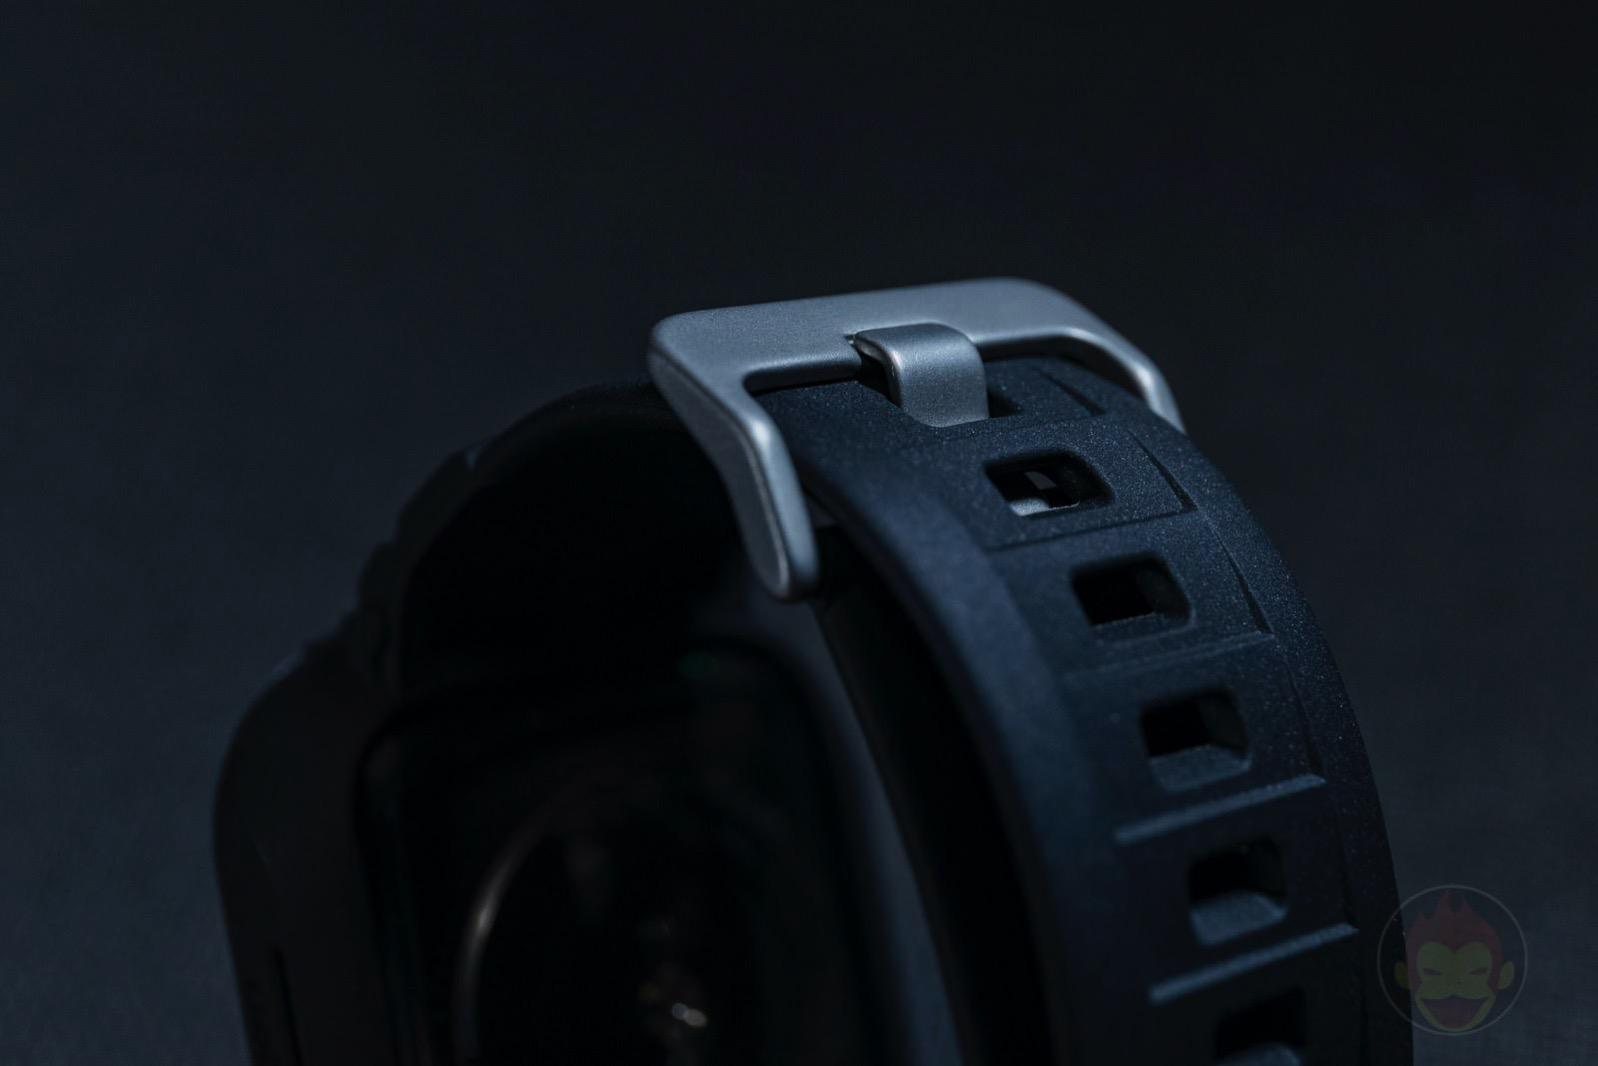 Spigen-Rugged-Armor-Pro-Apple-Watch-Band-and-case-04.jpg